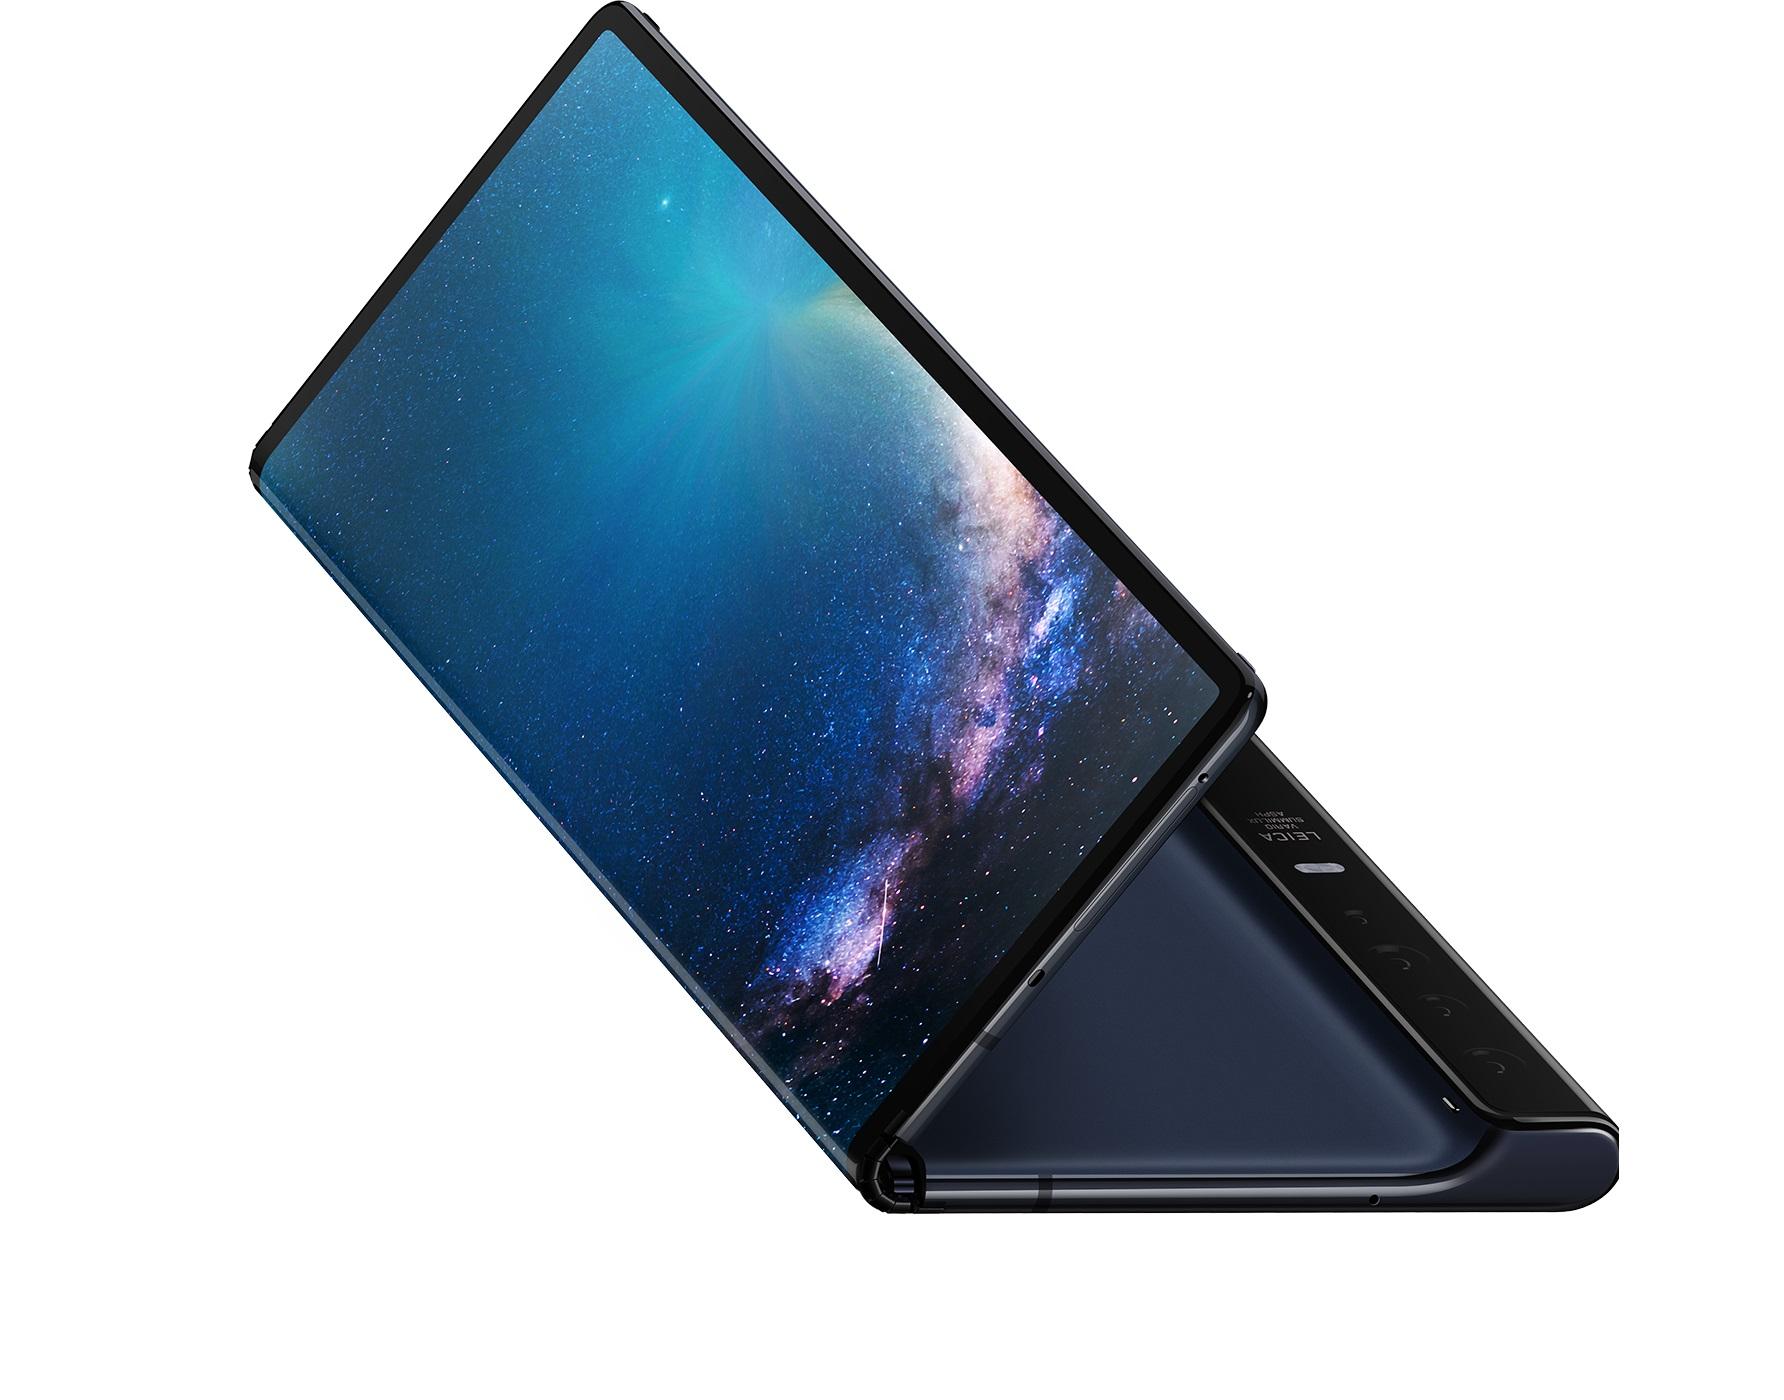 Huawei-Mate-X-Design-Innovative-Screen-Flexibility-2